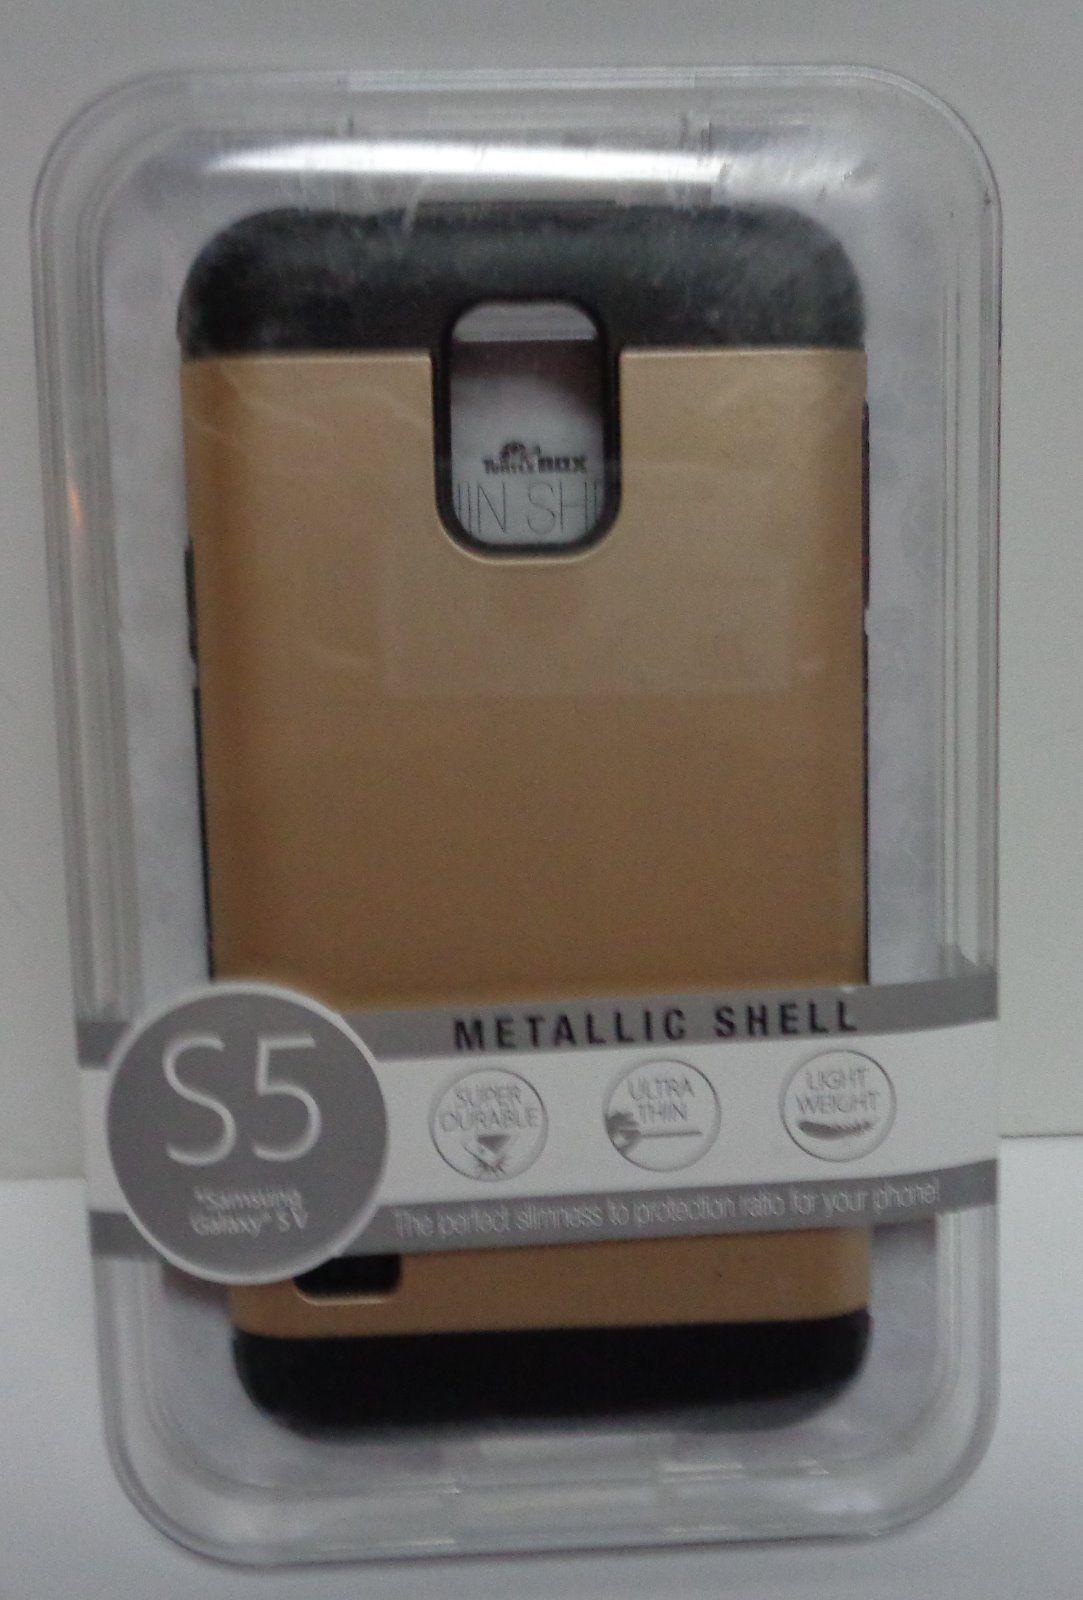 Samsung Galaxy S5 Gold & Black Cell Phone Case Metallic Shell NIB